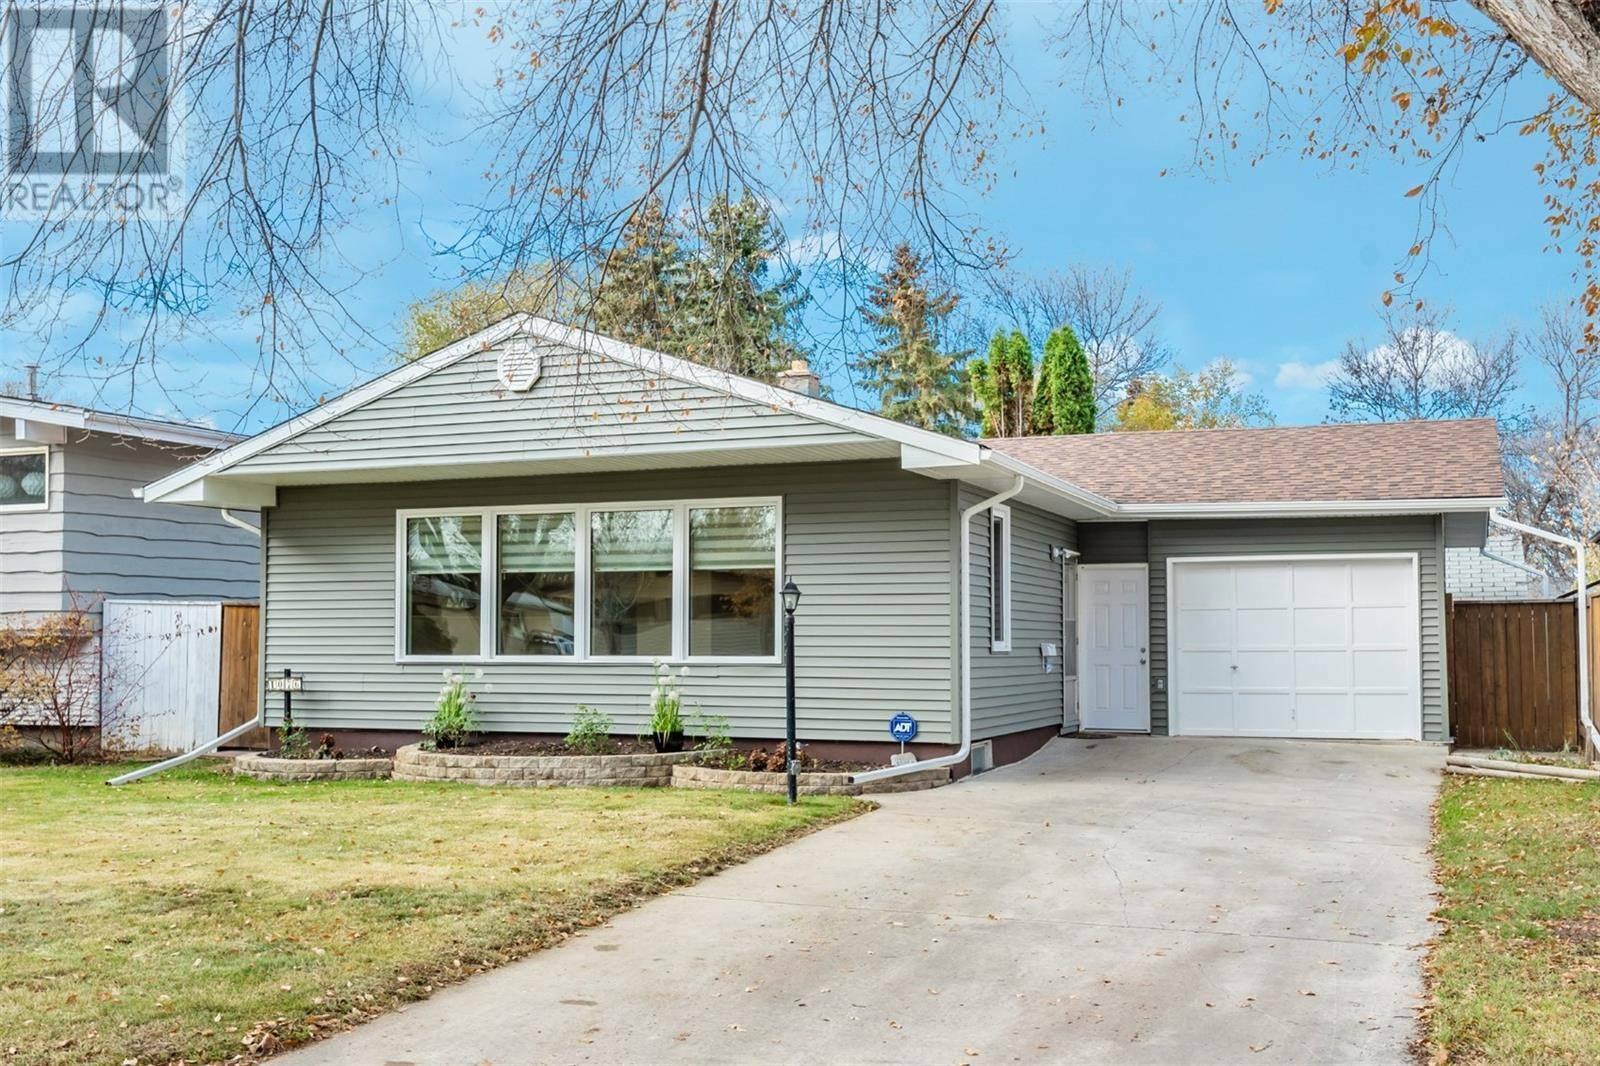 House for sale at 1076 East Ce Saskatoon Saskatchewan - MLS: SK790156